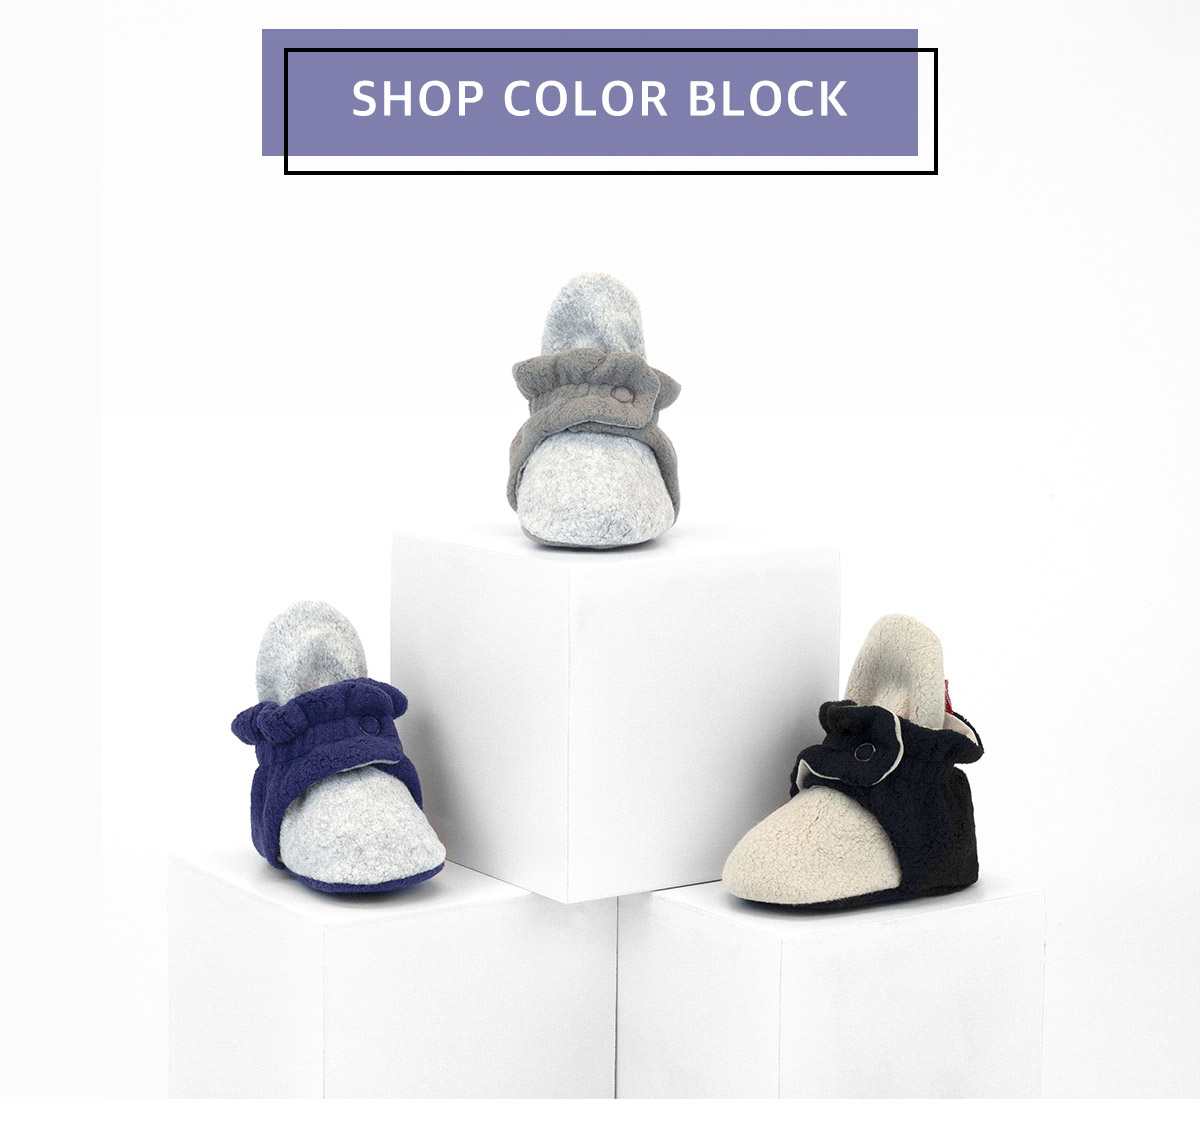 Shop color block.